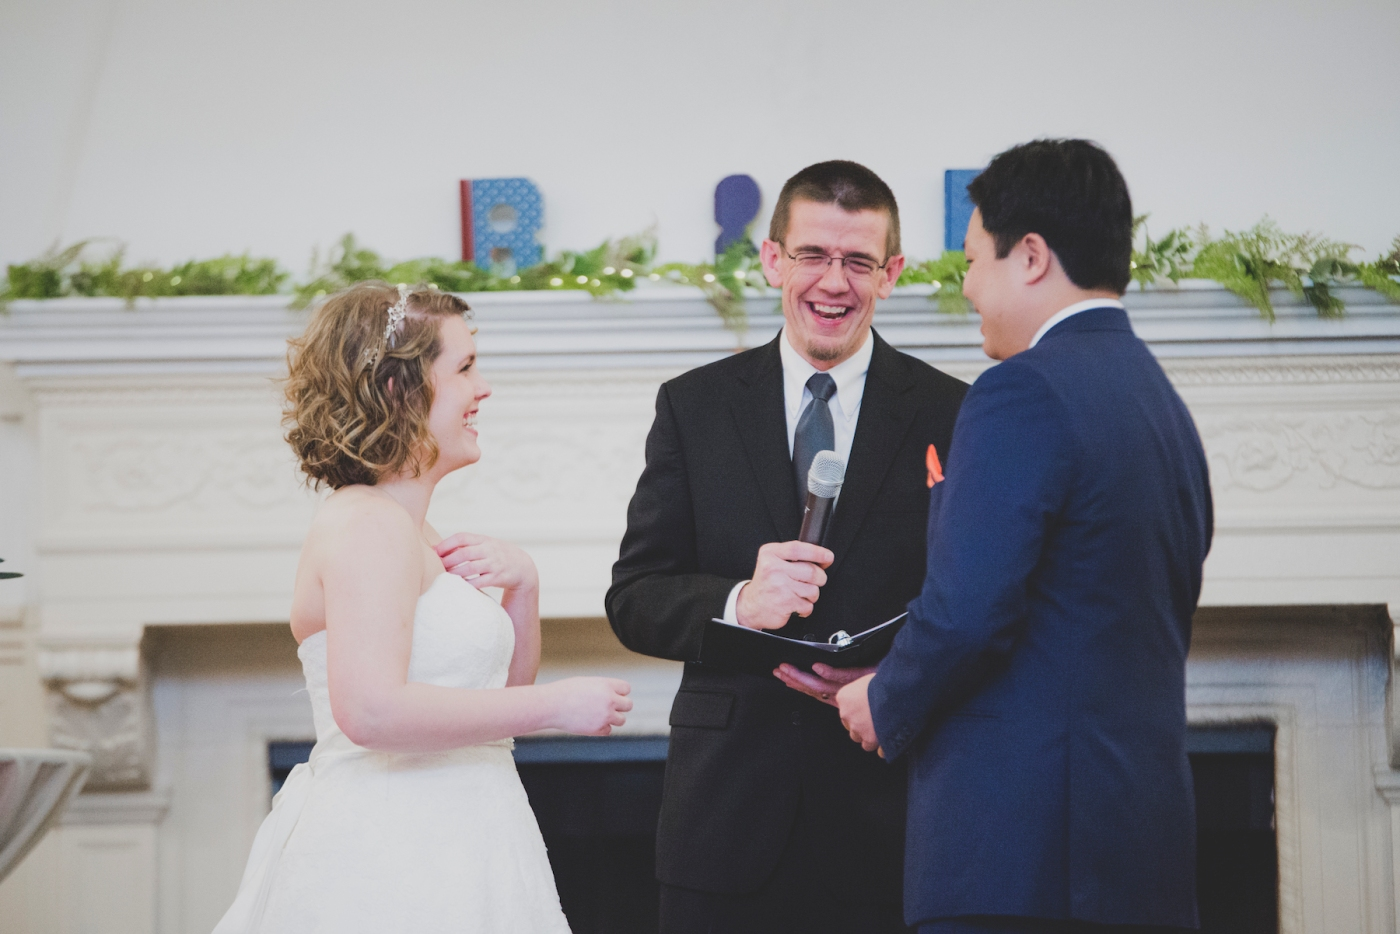 DSC_2679Everett_Wedding_Ballroom_Jane_Speleers_photography_Rachel_and_Edmund_Ceremony_2017